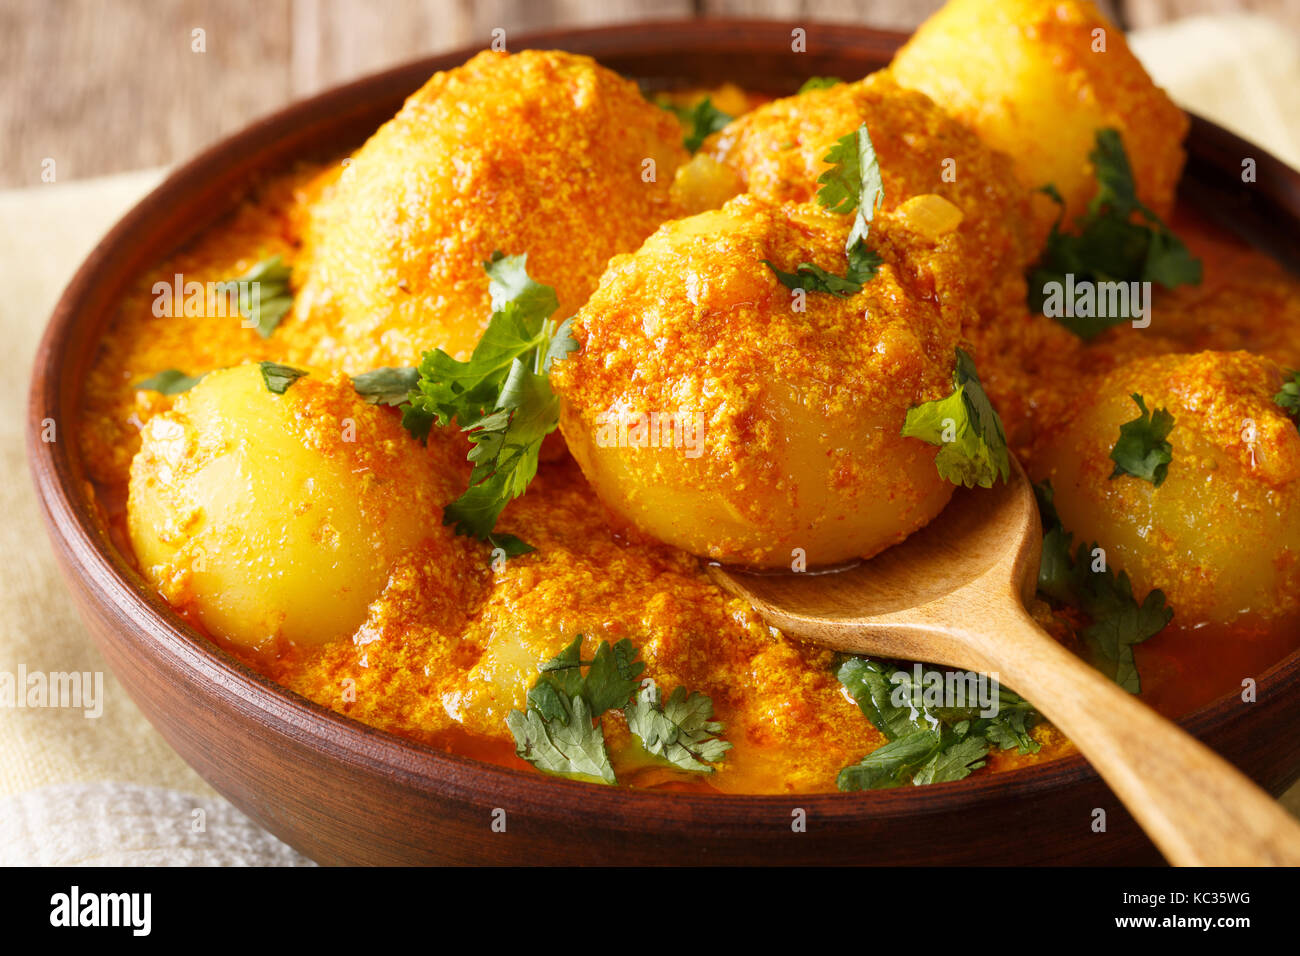 Kashmiri dum aloo: spicy potato closeup on the pan on the table. Horizontal - Stock Image